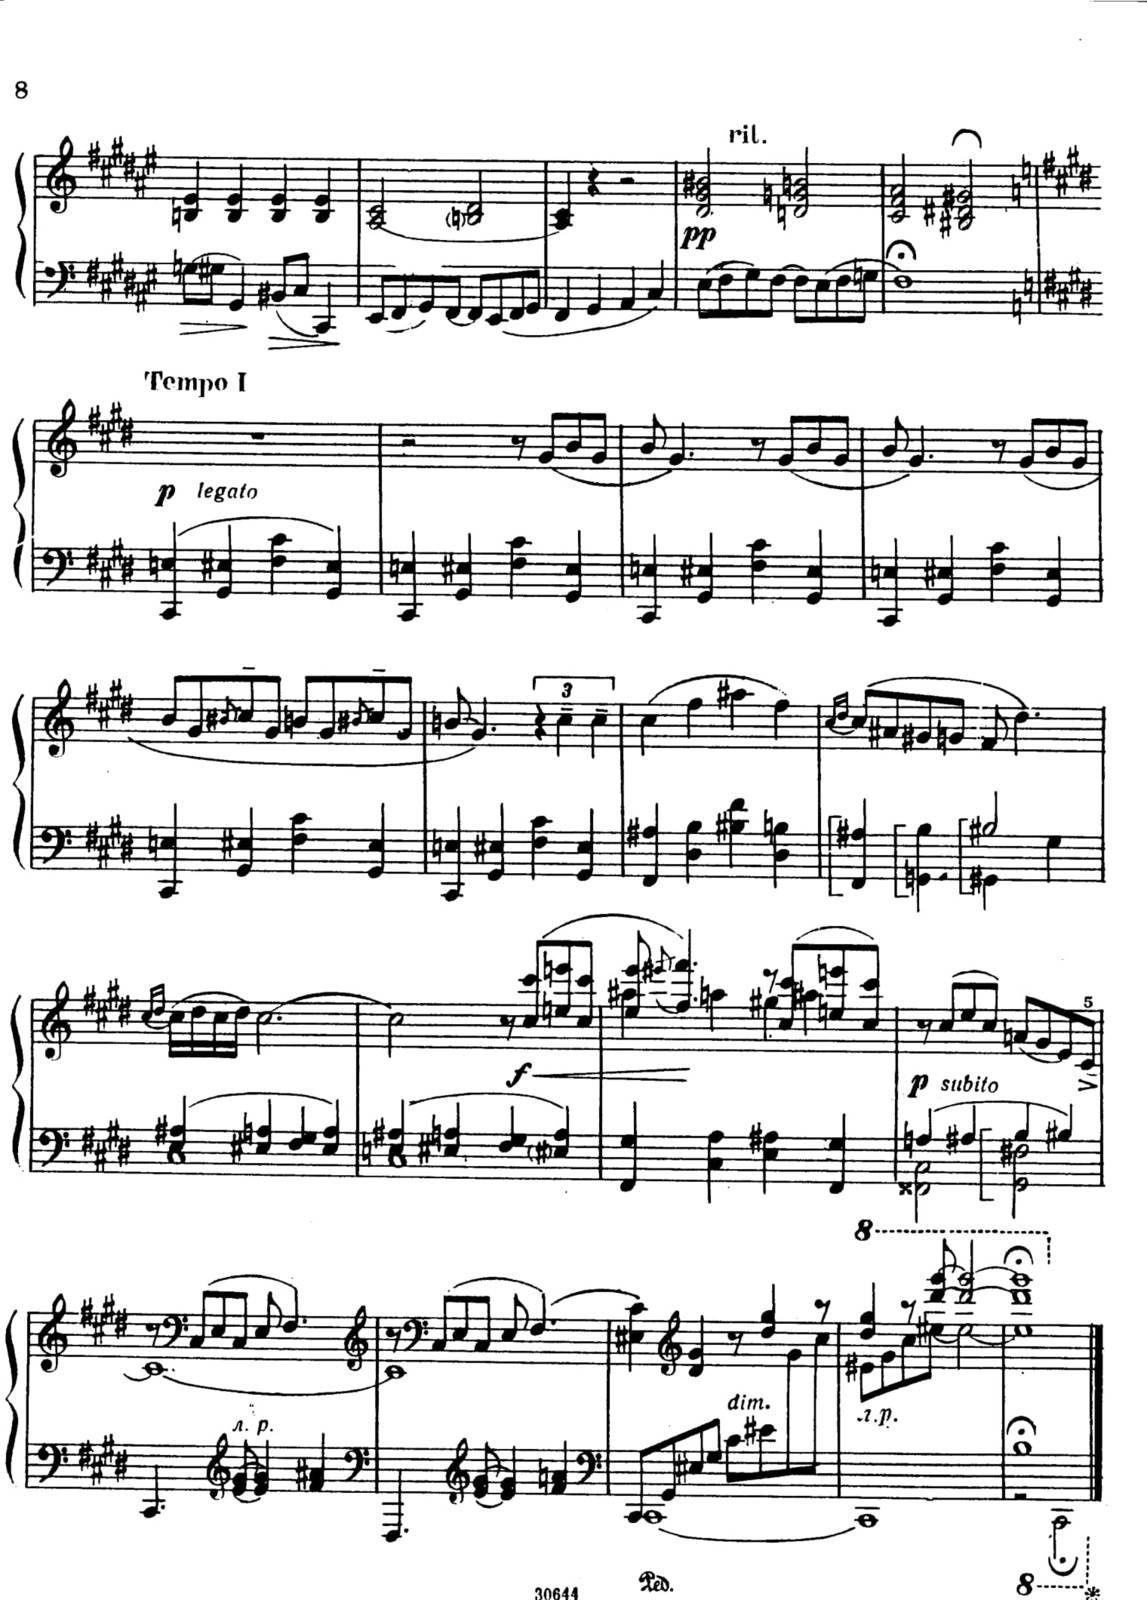 "Partitura Para Piano""Preludios"" |Gershwin"